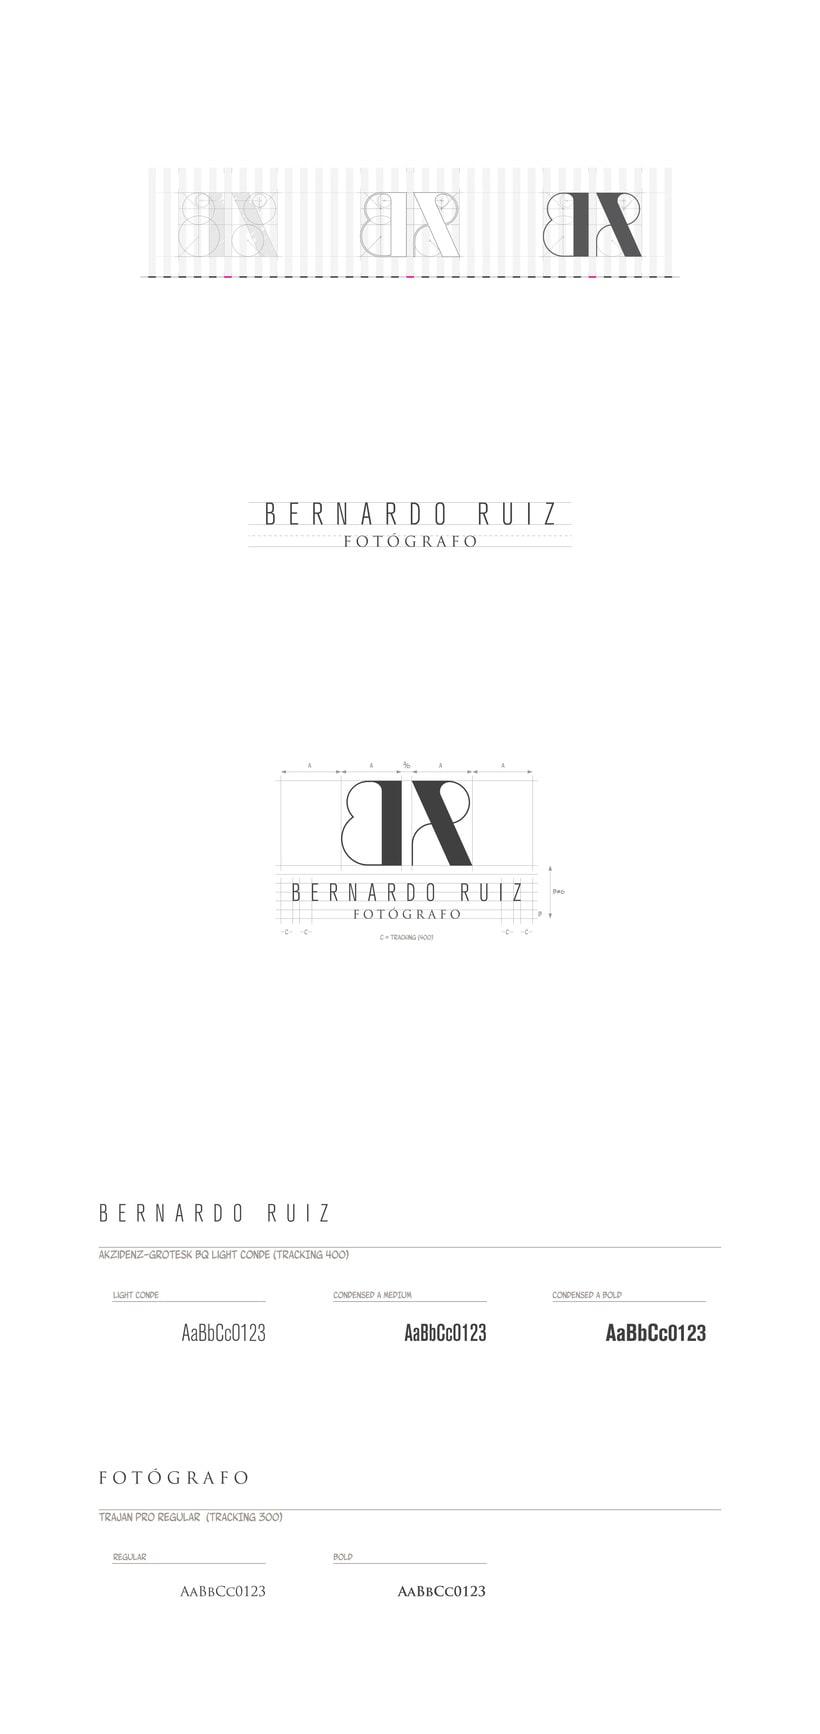 Bernardo Ruiz 1